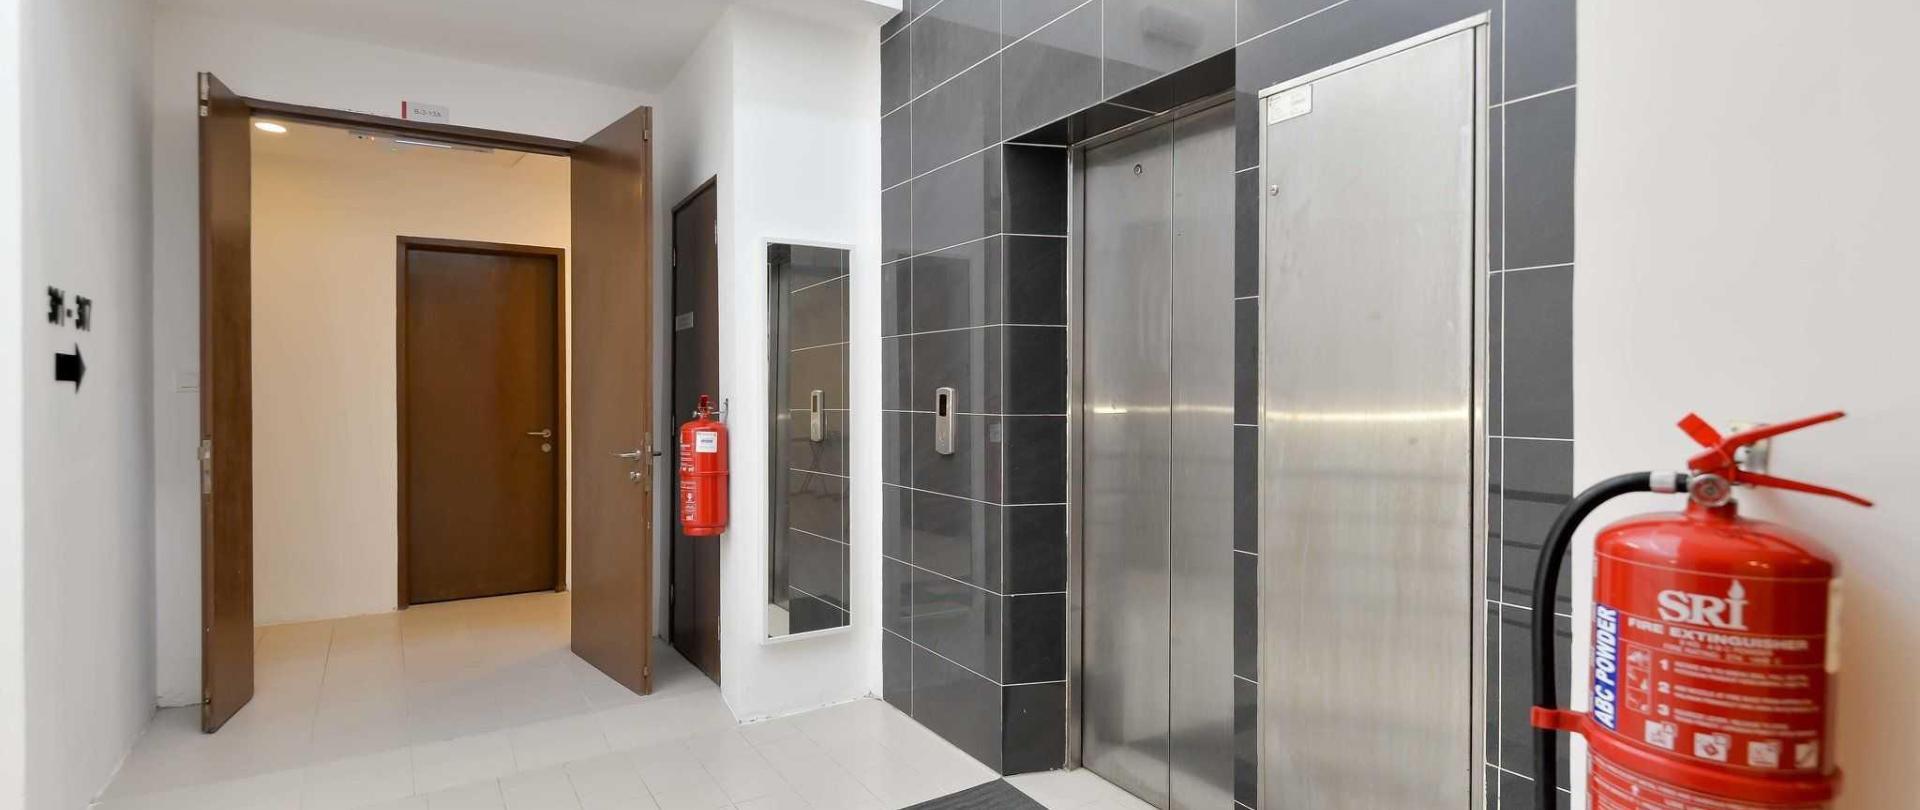 de-ideal-hotel-59.jpg